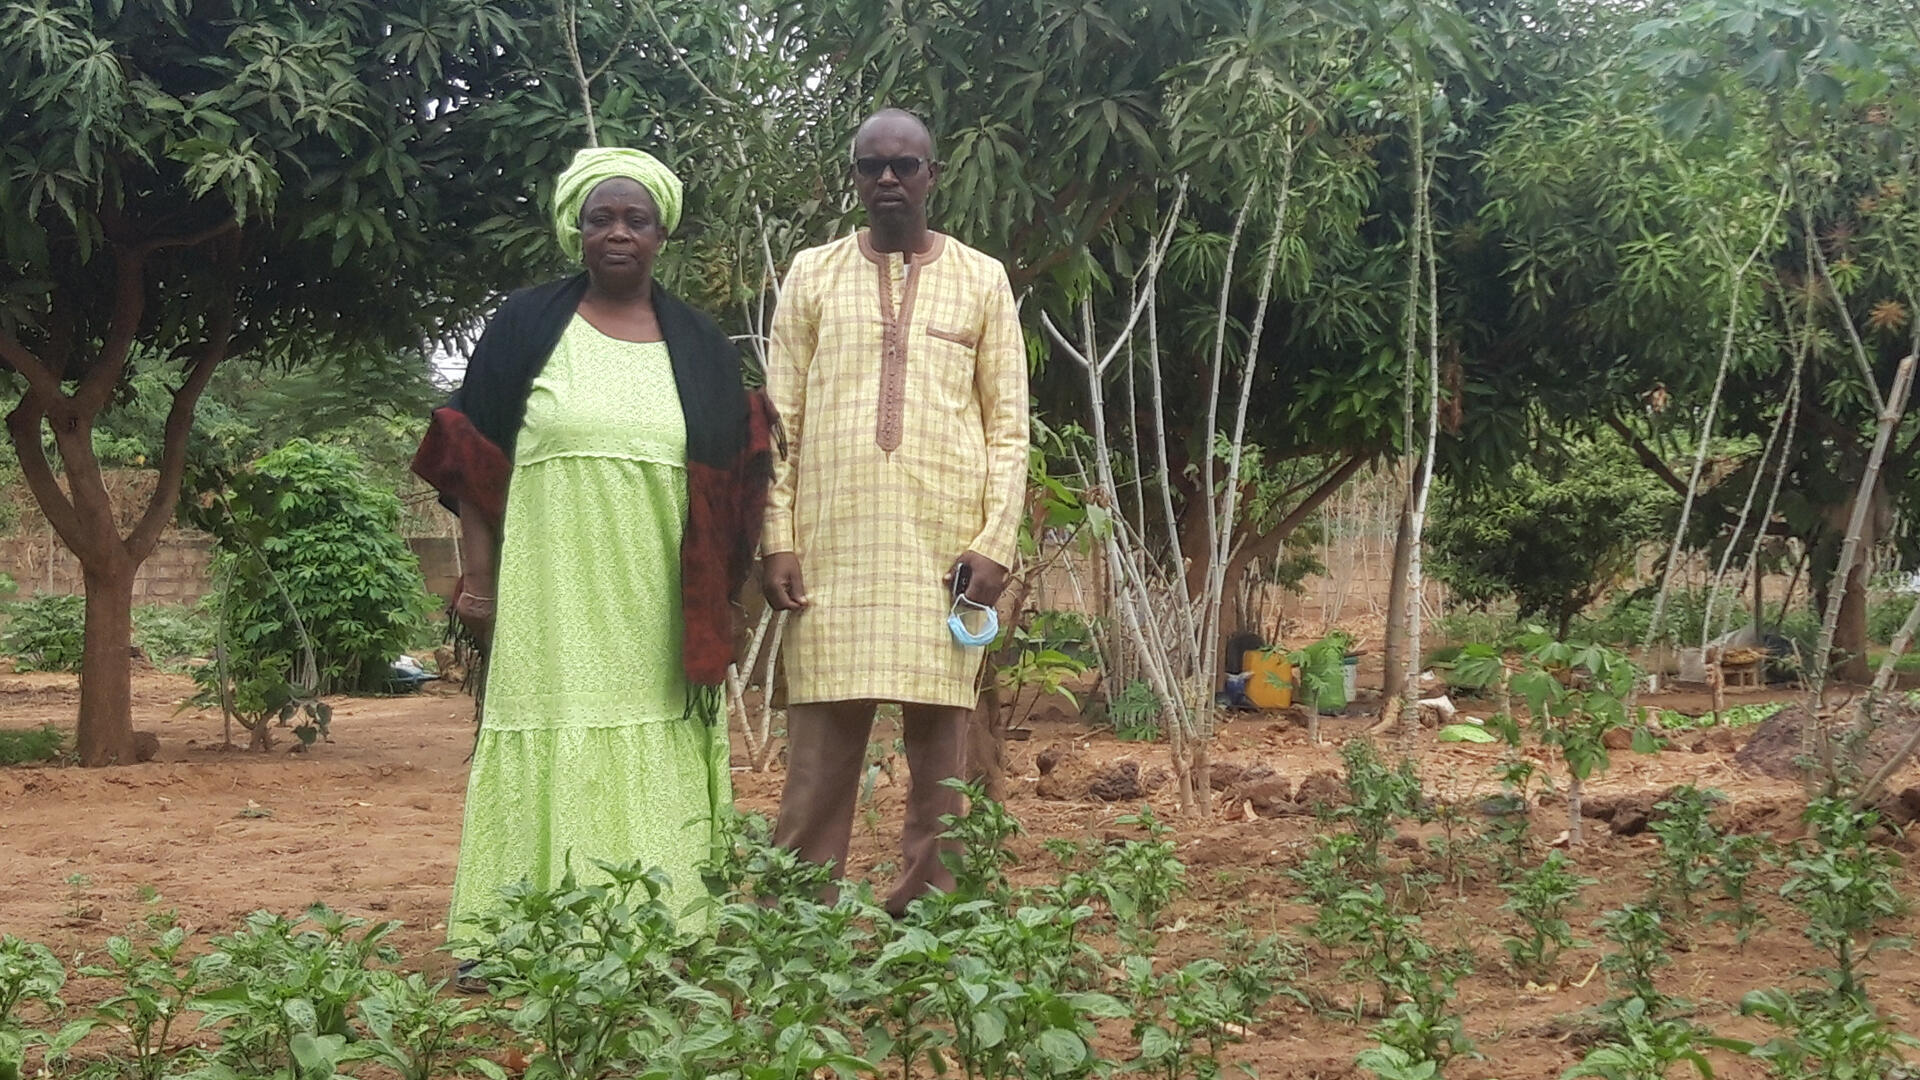 Sénégal - Ndayane - Port - Habitants mécontents - 20210118_121656